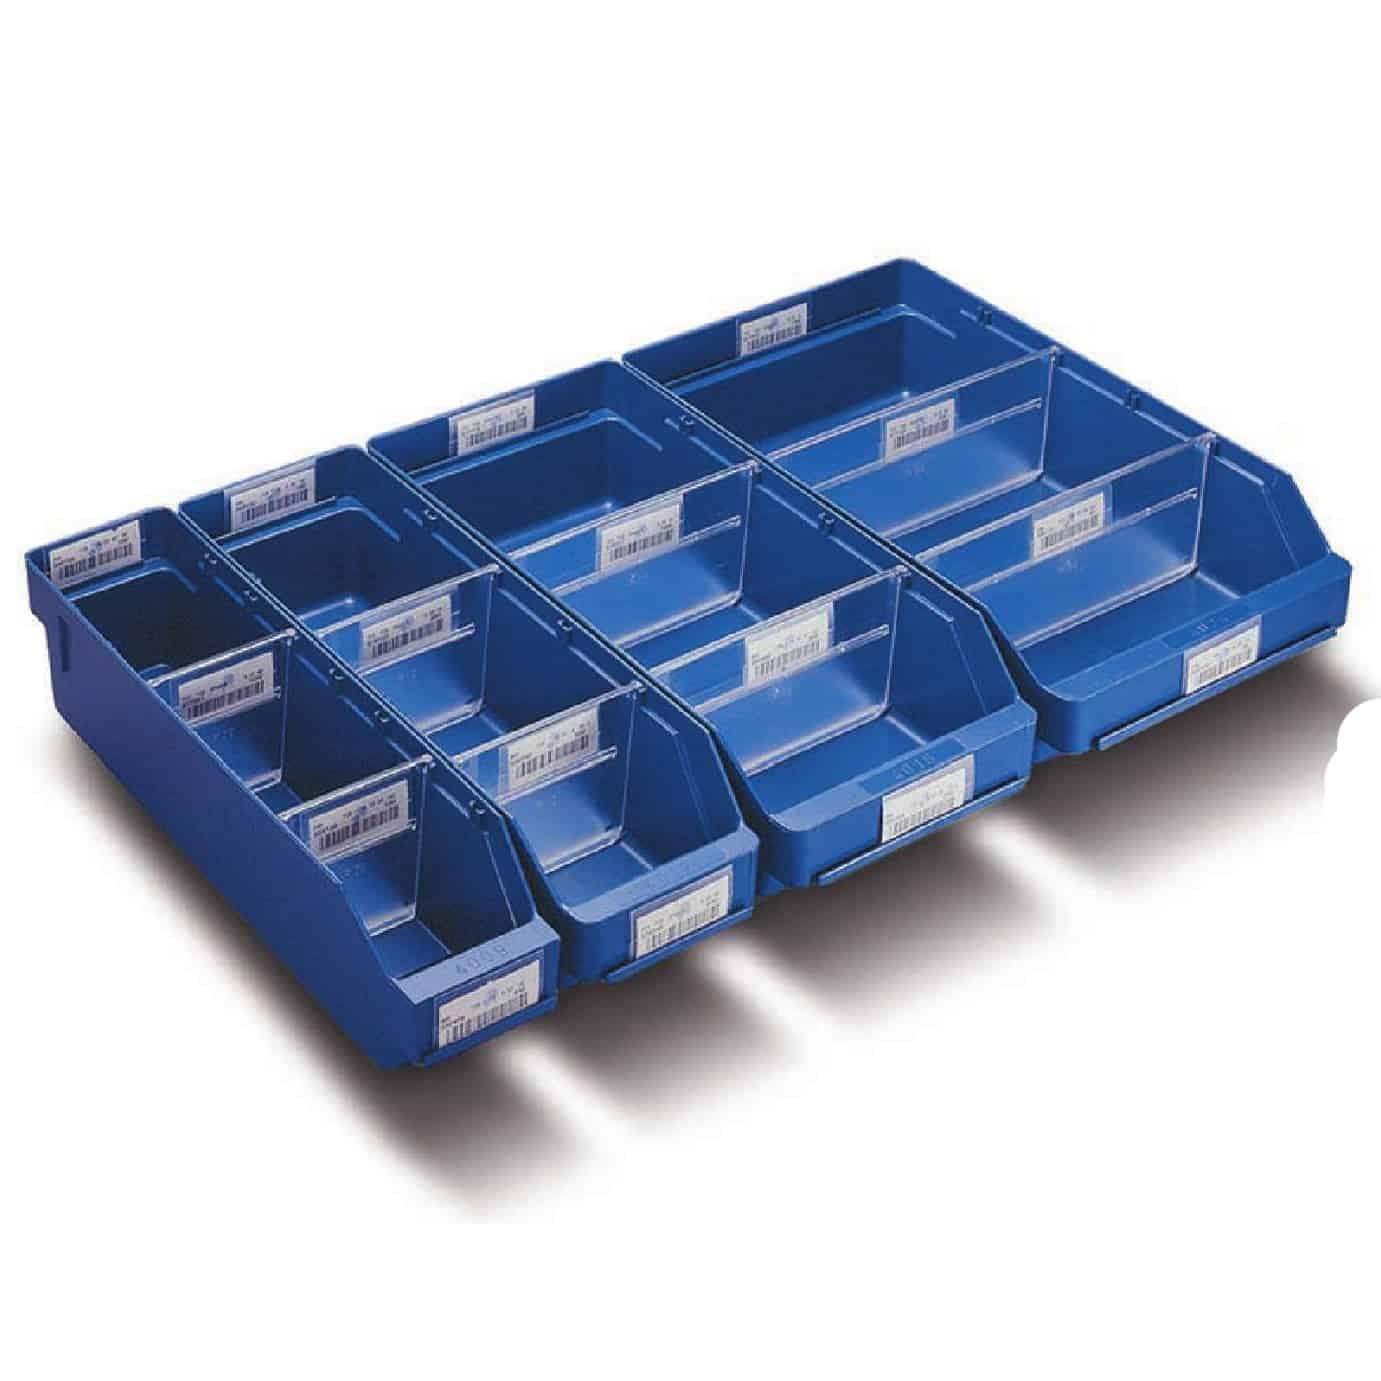 Barton Topstore Small Parts Shelf Bins